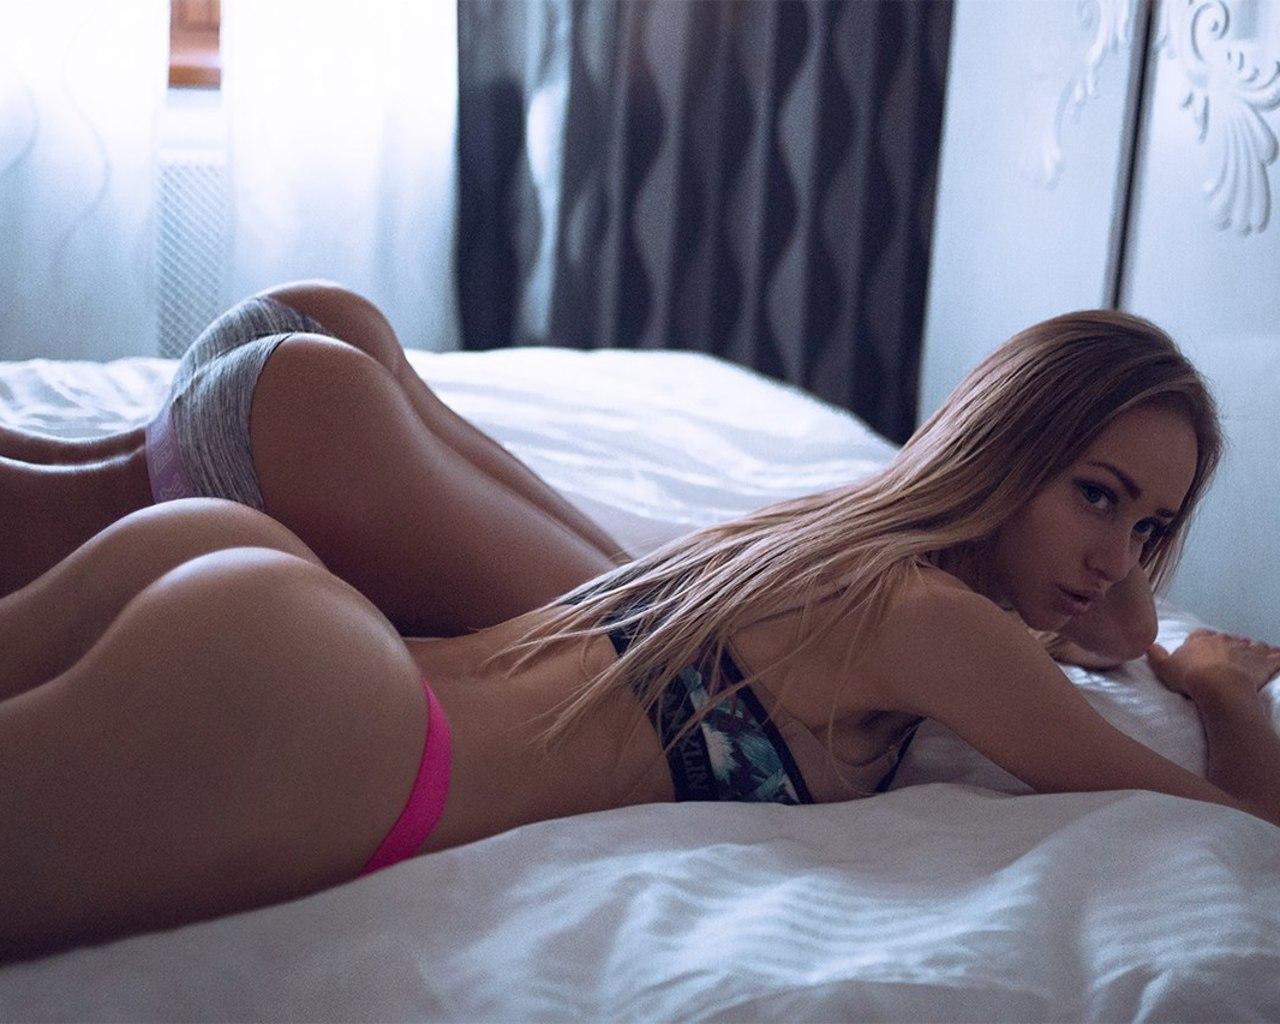 women-blonde-ass-long-hair-underwear-lying-on-front